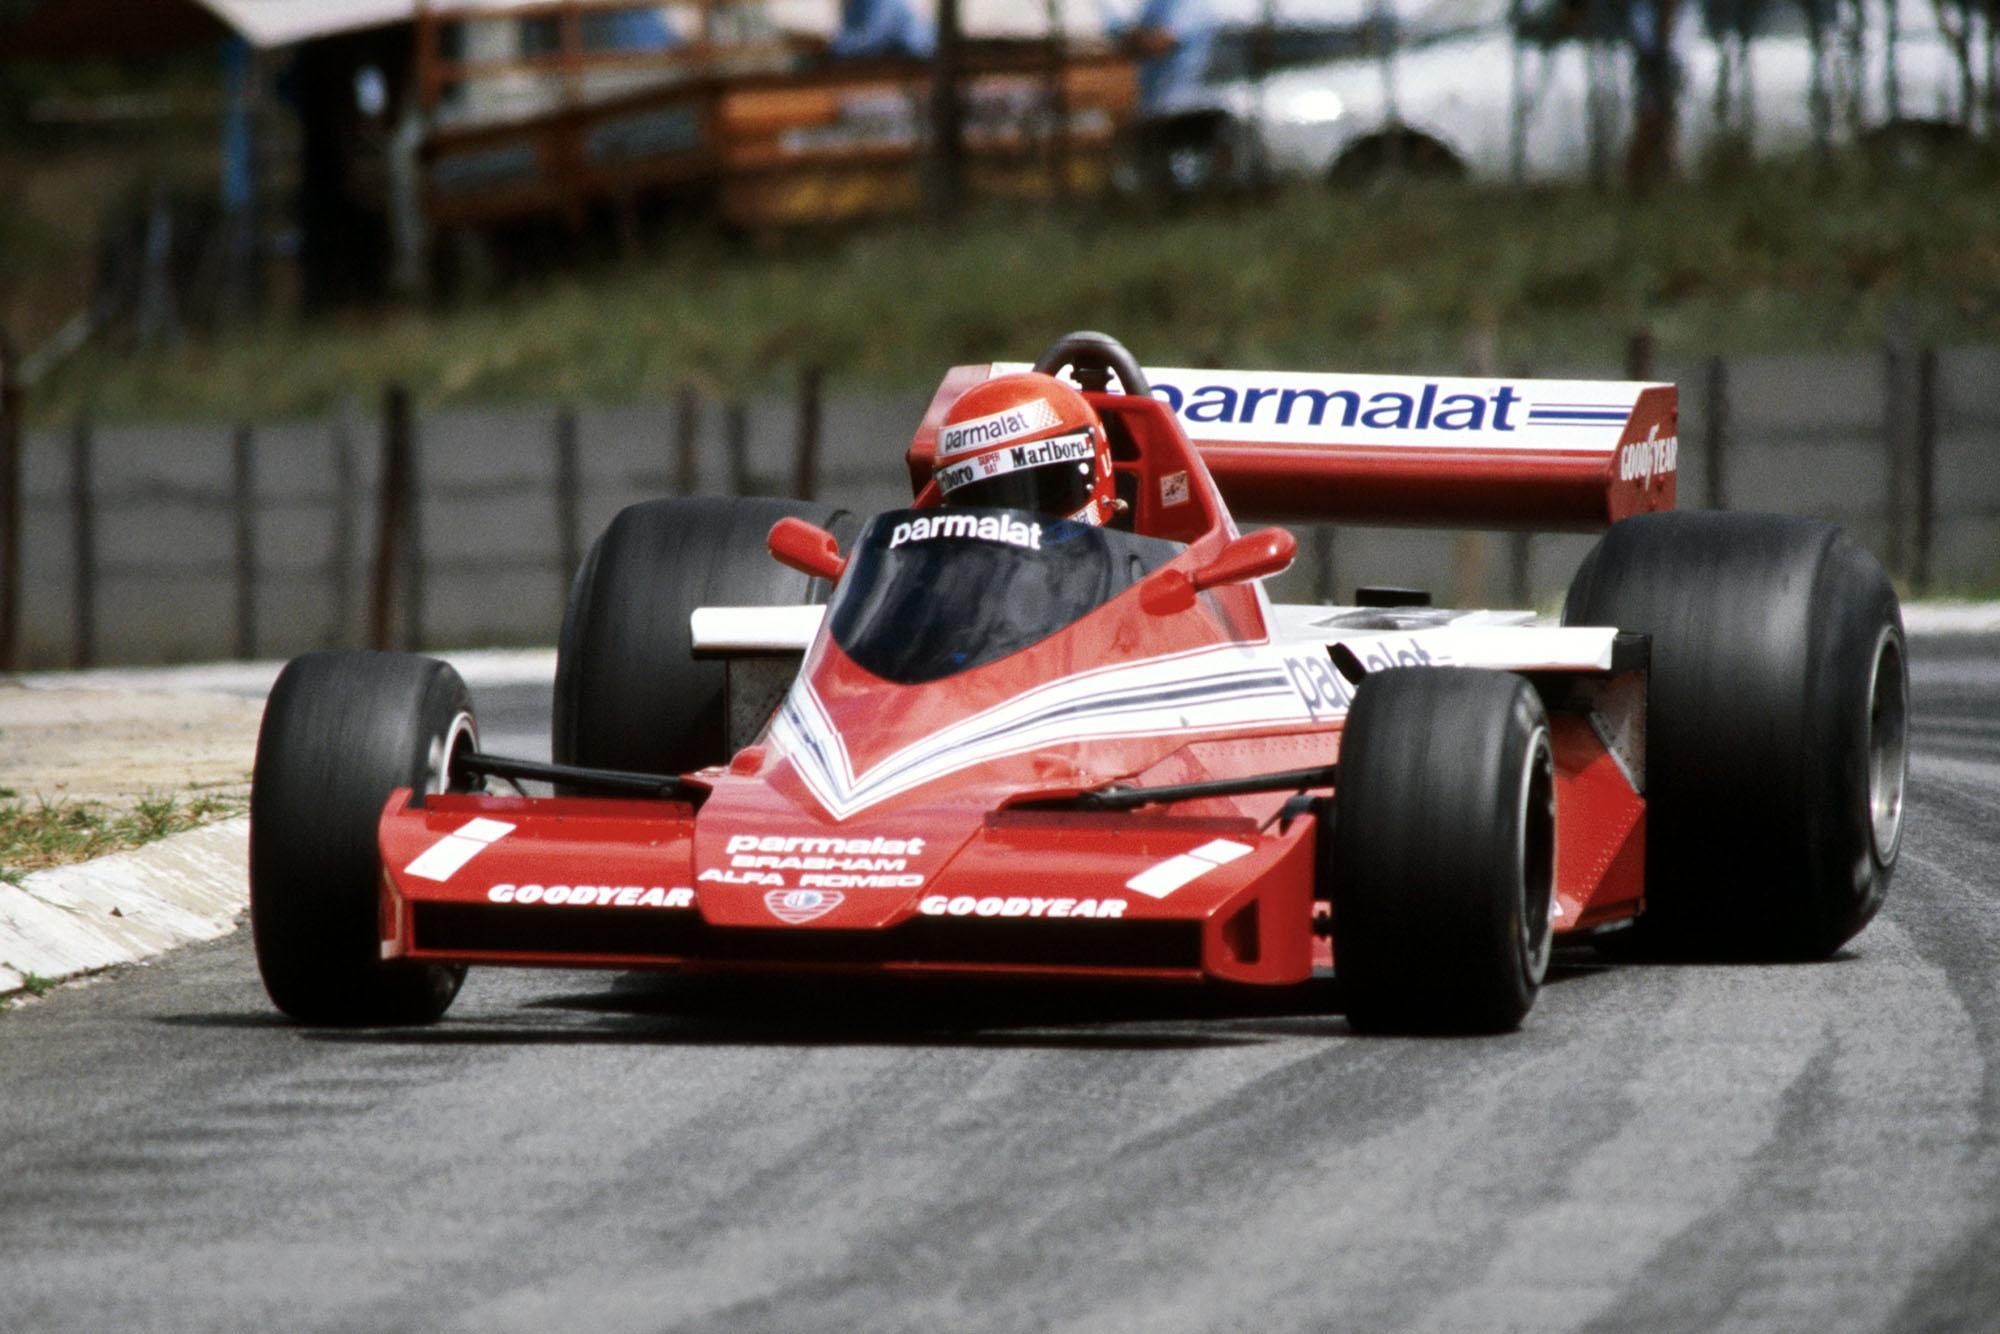 Niki Lauda (Brabham) oversteers at the 1978 South African Grand Prix, Kyalami.